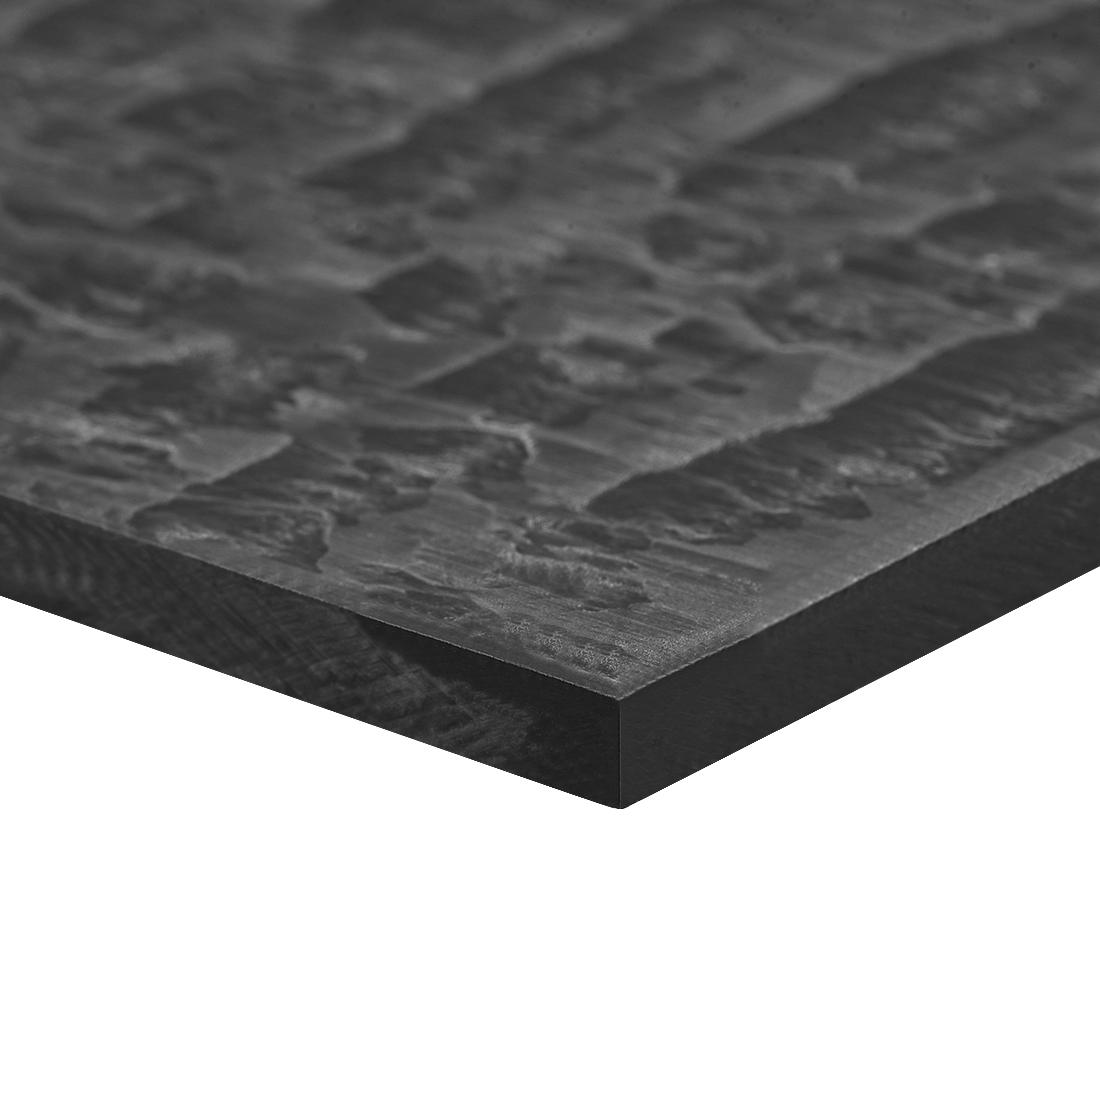 Acetal POM Sheet Polyoxymethylene Plate Sheet 300 x 200 x 5mm Black